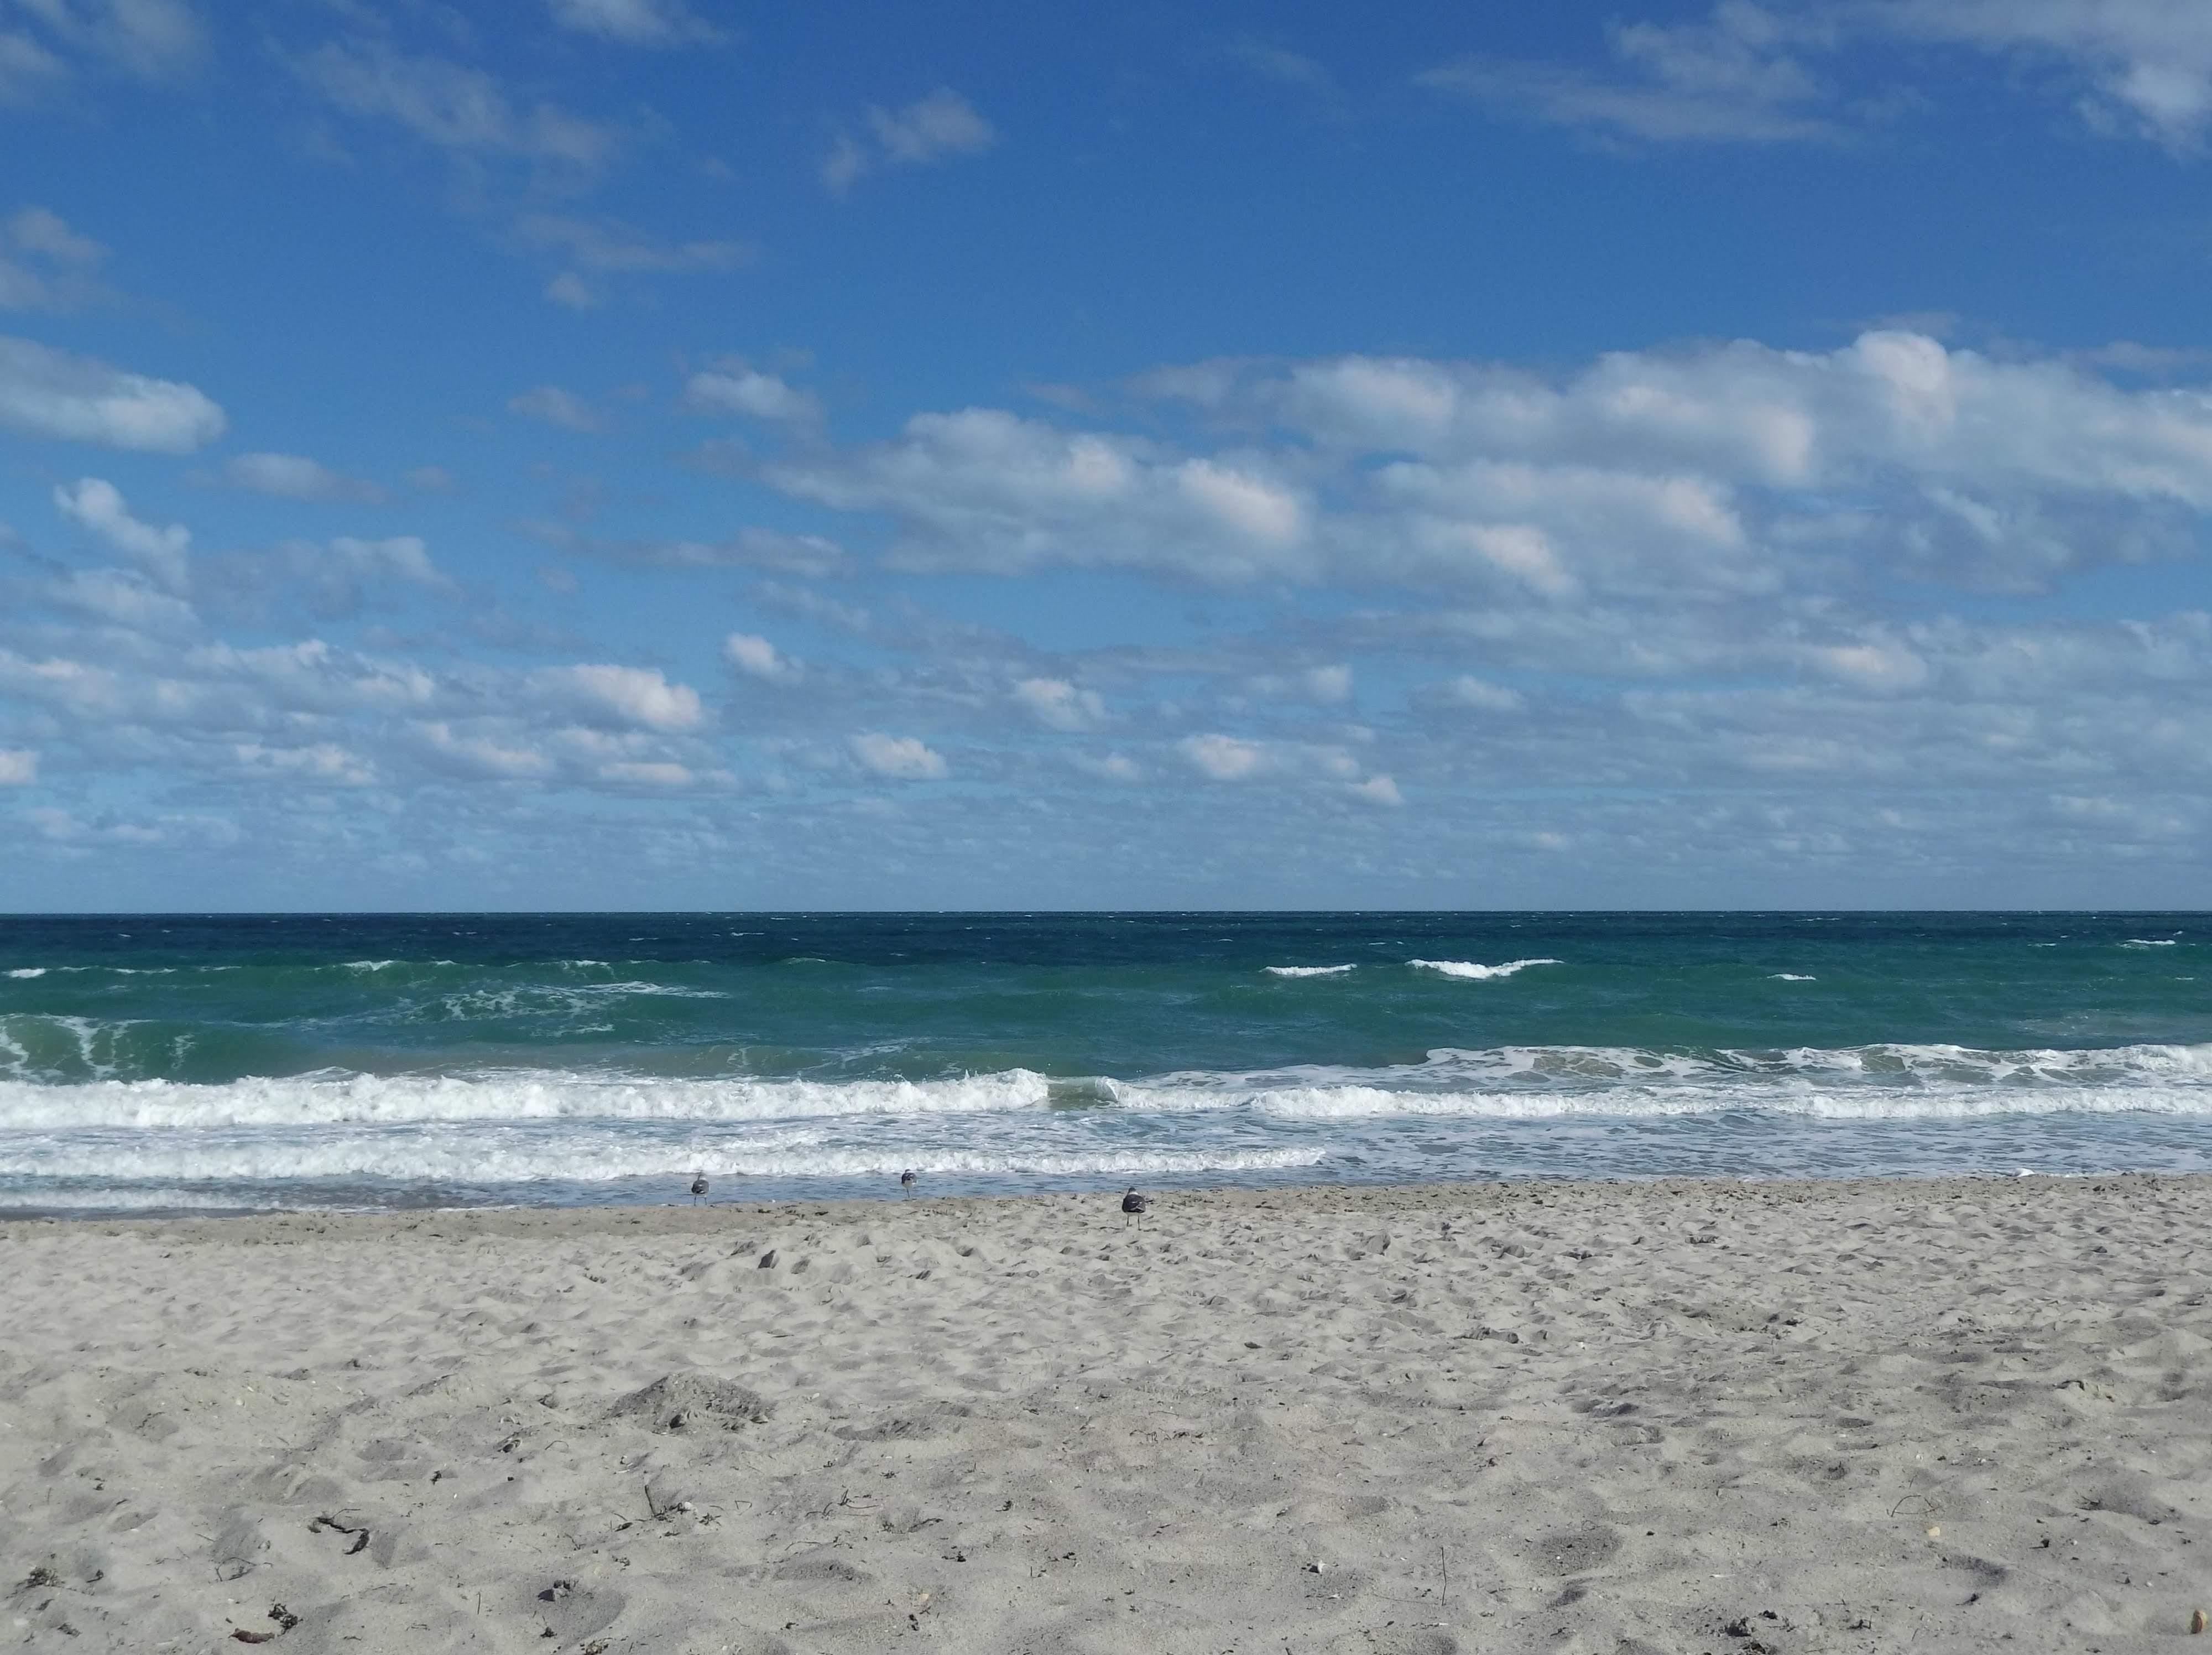 Beach at Melbourne Florida 4000x2992[oc] #Music #IndieArtist